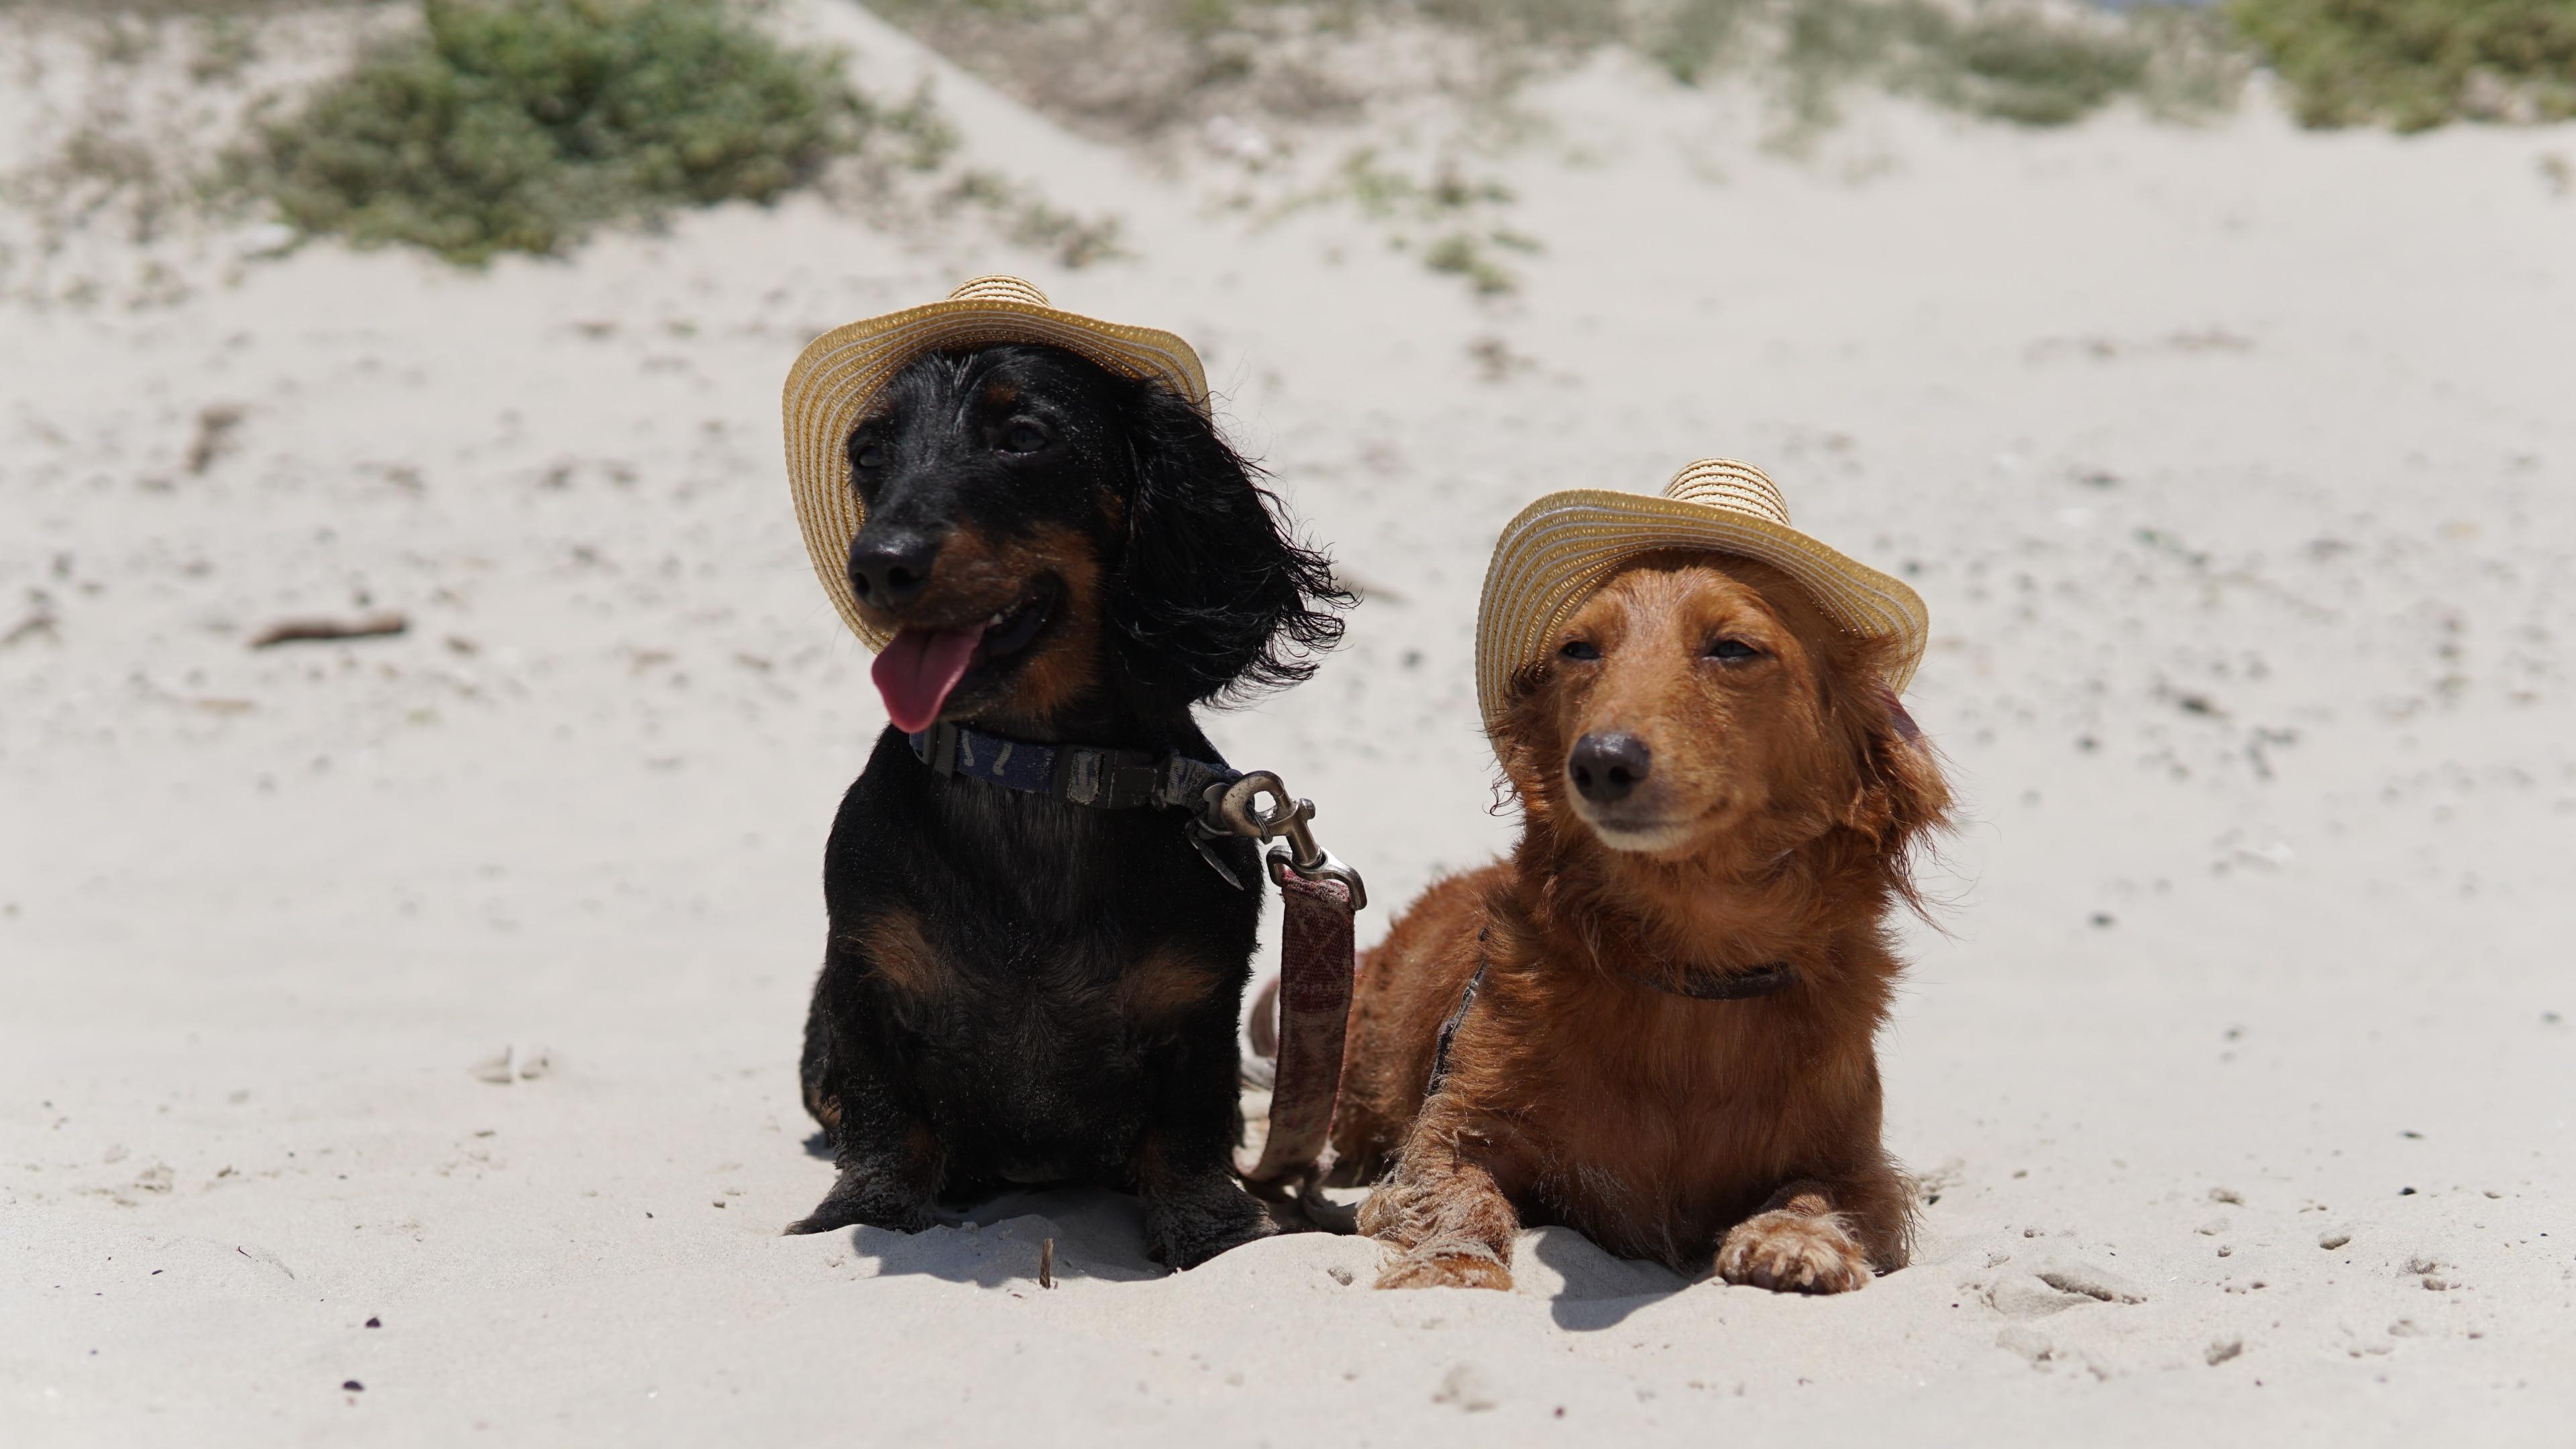 Port Aransas Beach, Port Aransas, Texas, United States of America